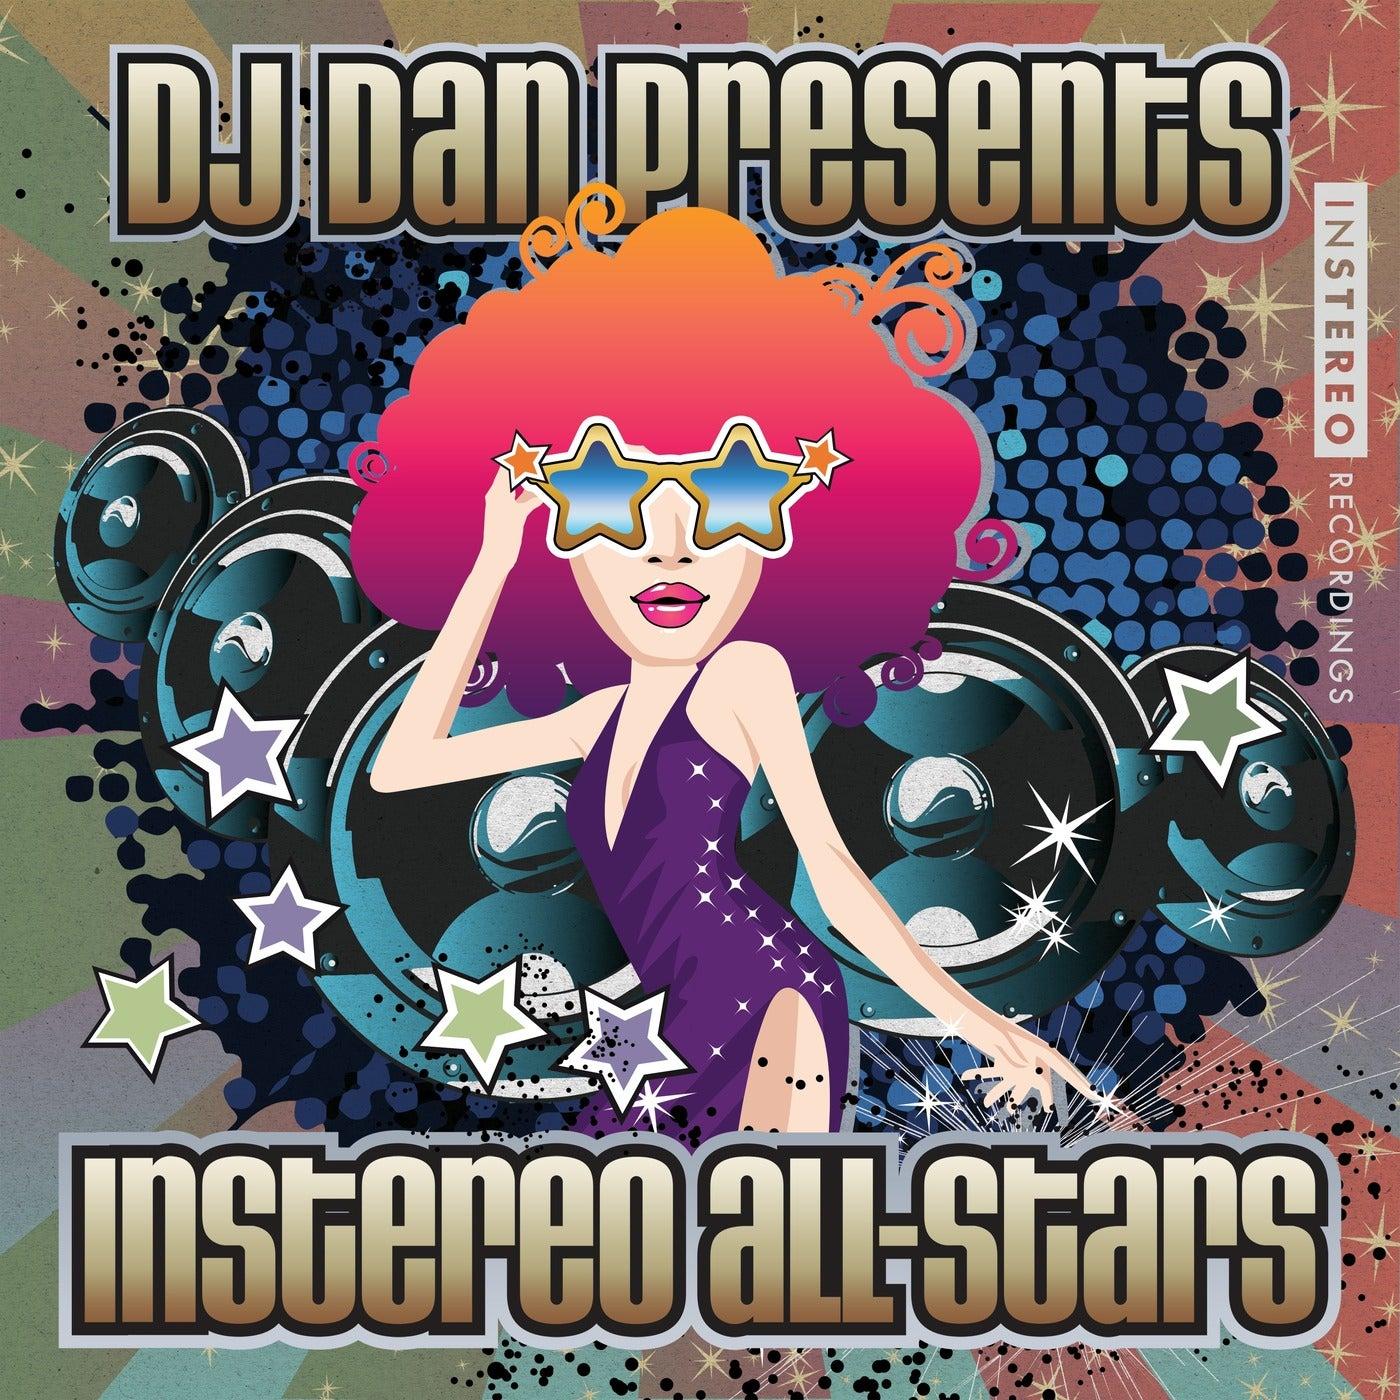 Stereophonic (Original Mix)